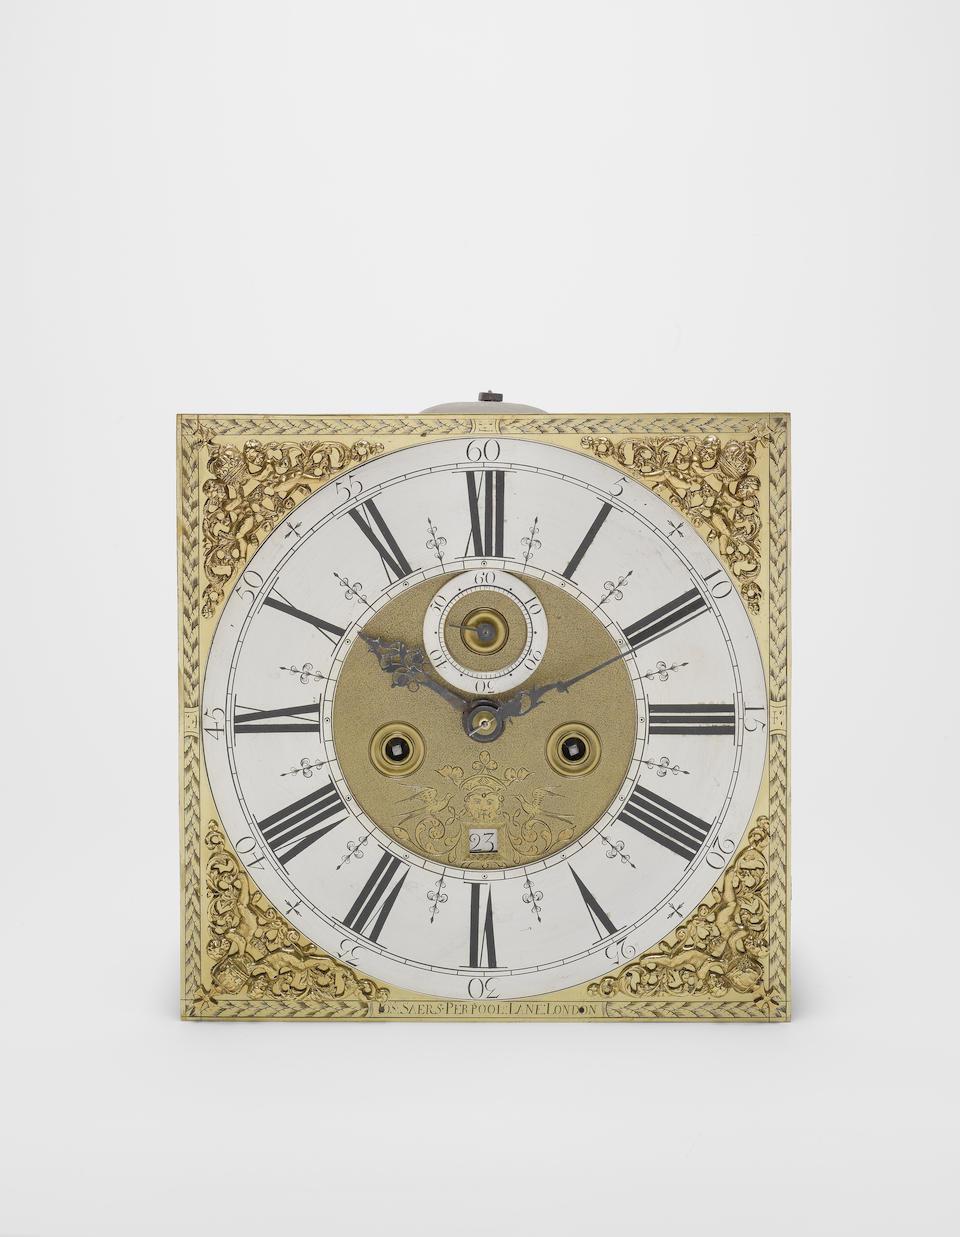 A good early 18th century walnut longcase clock Joseph Saers, Perpool Lane, London